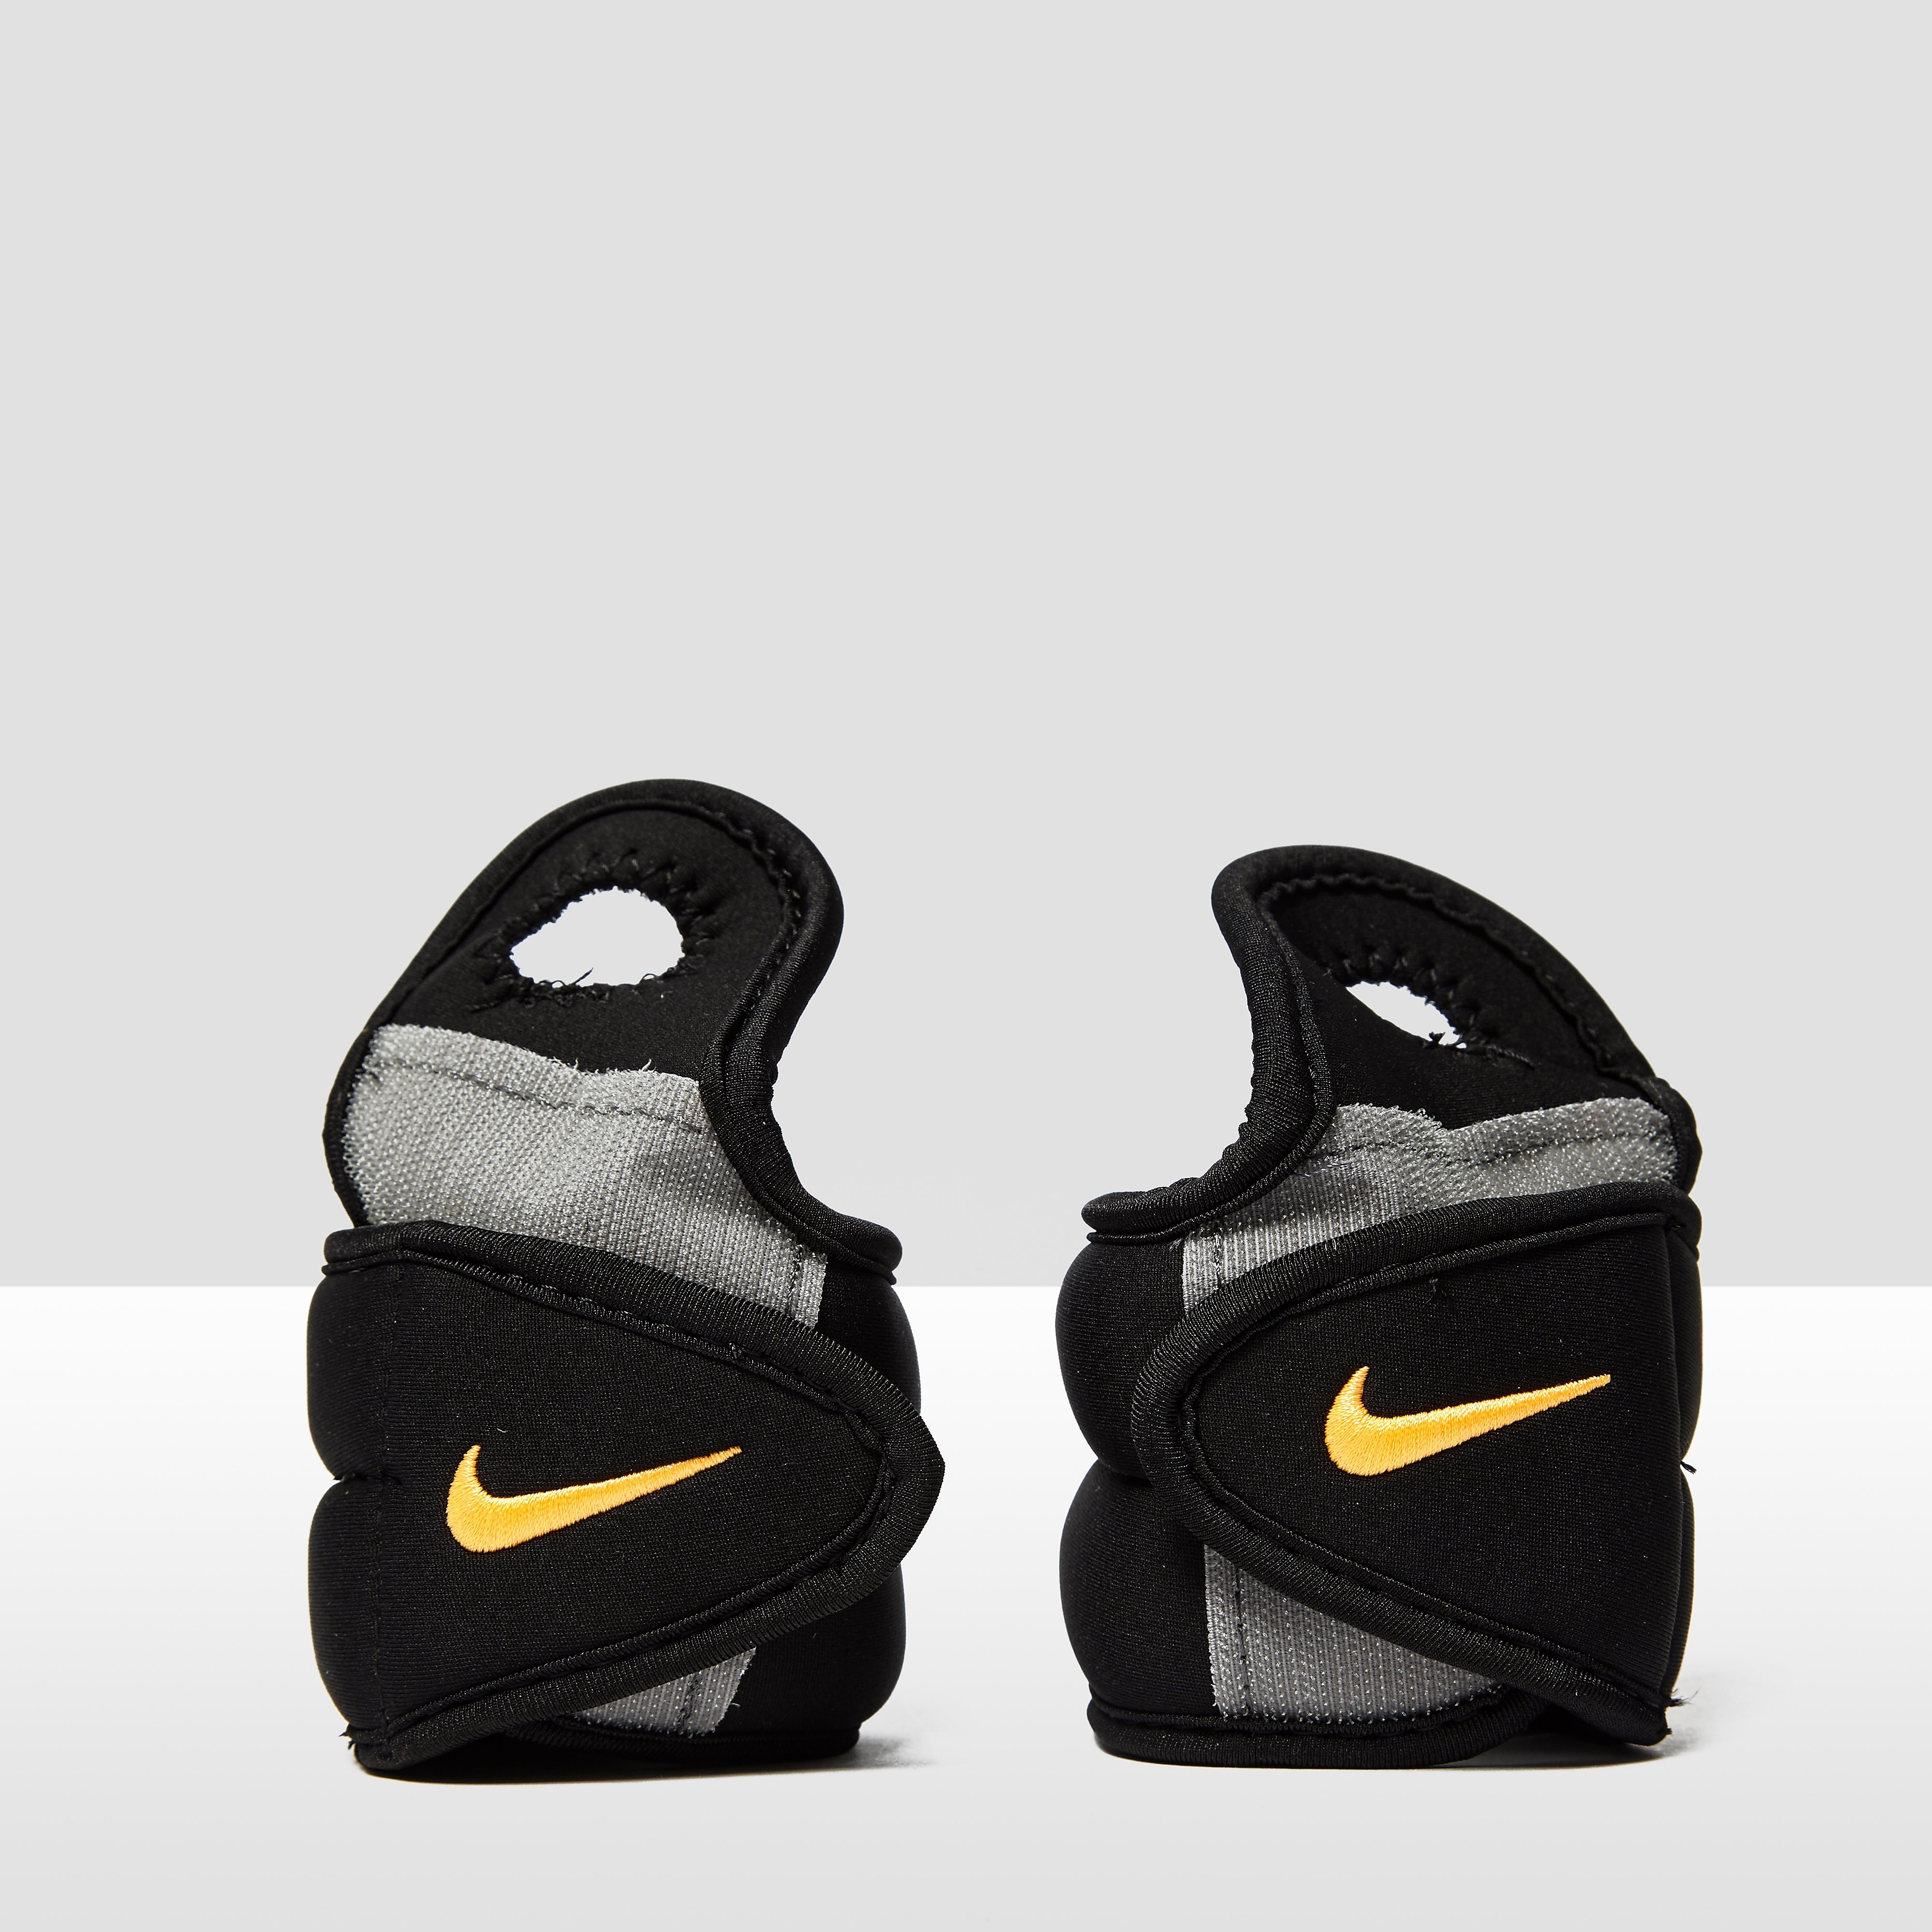 Nike Wrist Weight 1LB